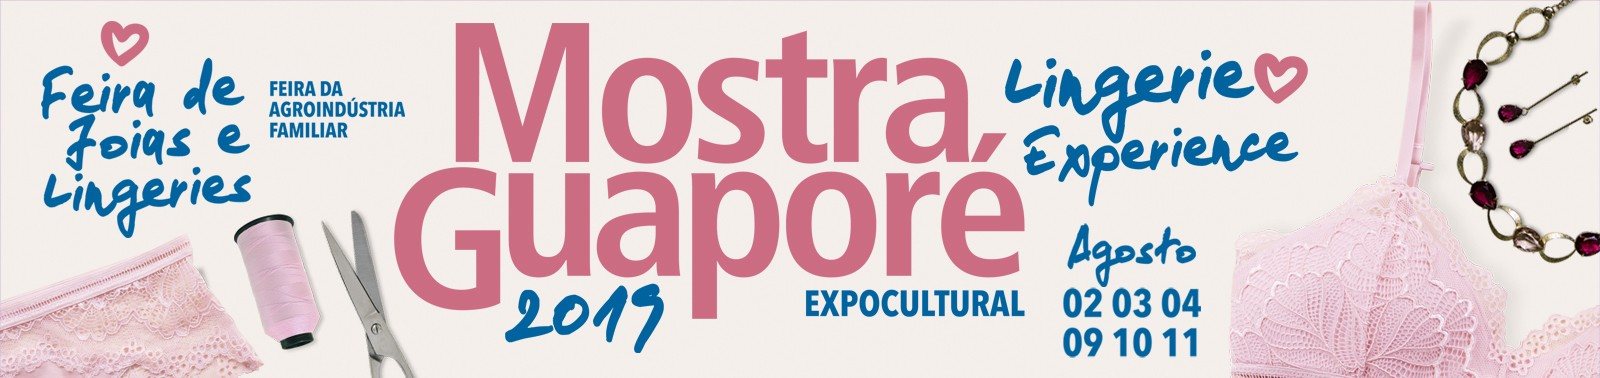 Banner 2 - Mostra Guaporé 2019